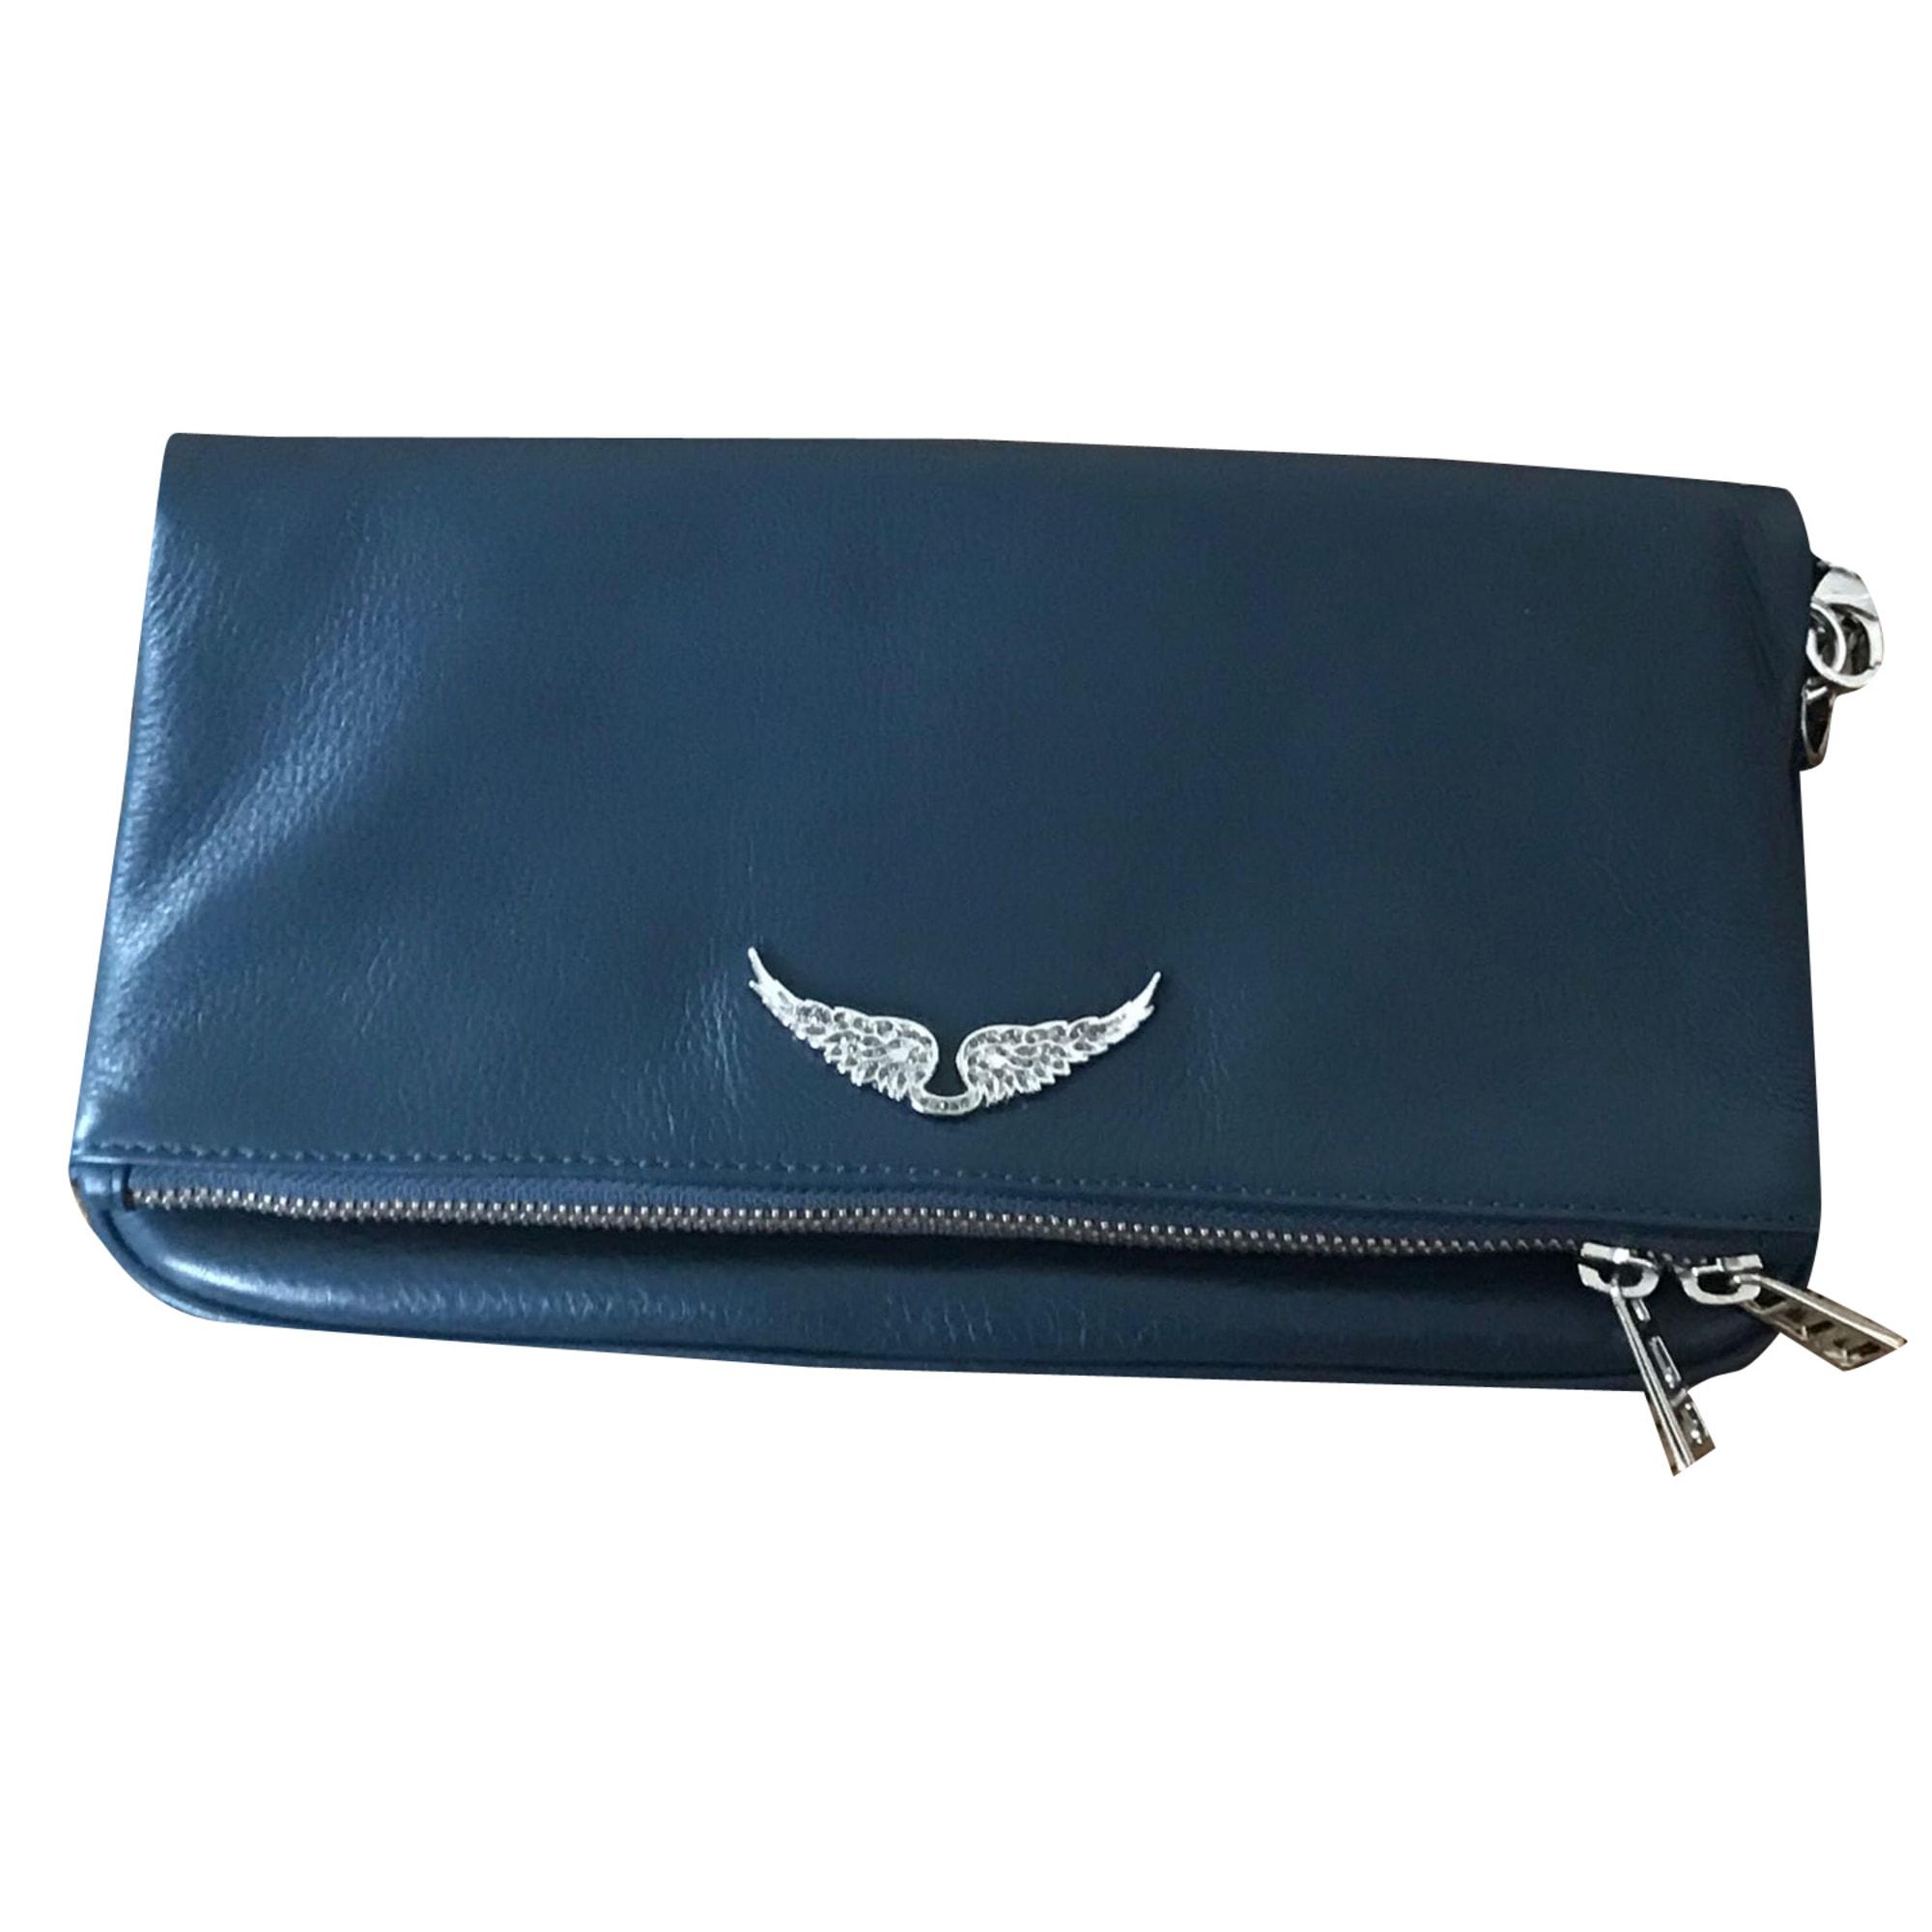 Sac pochette en cuir ZADIG & VOLTAIRE Bleu, bleu marine, bleu turquoise